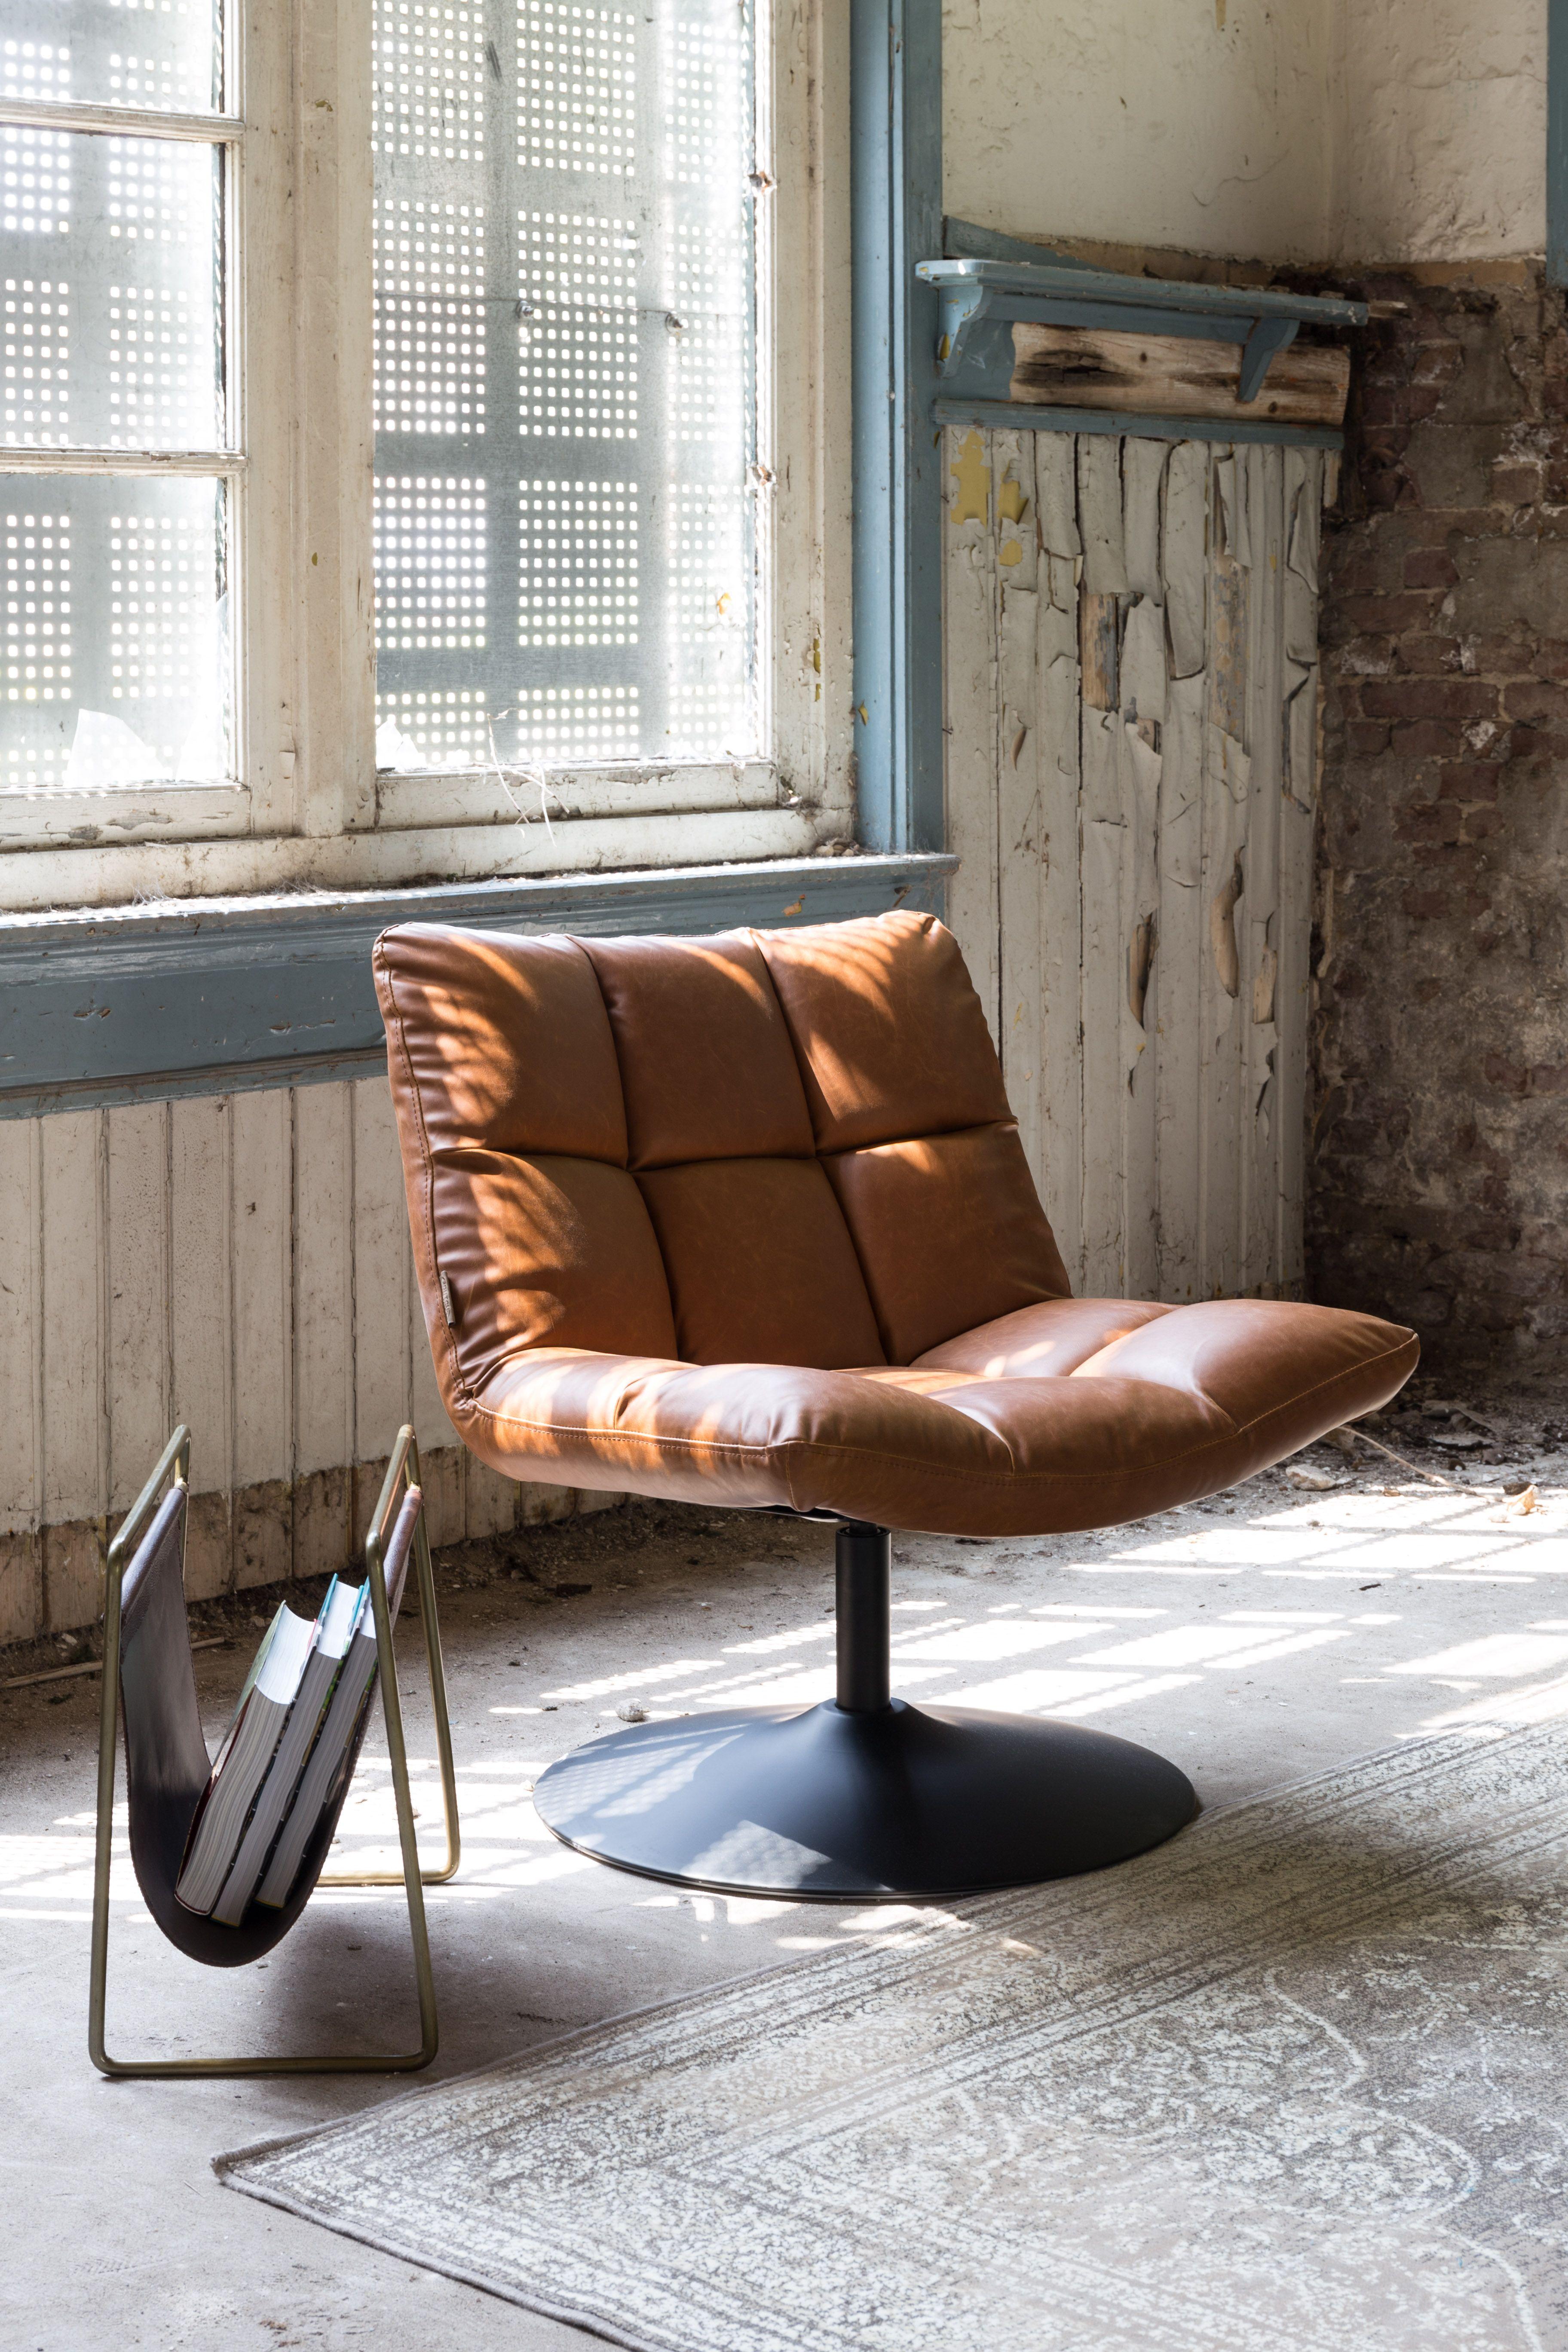 Bar lounge chair - Woonkamer Smederij | Pinterest - Huiskamer ...